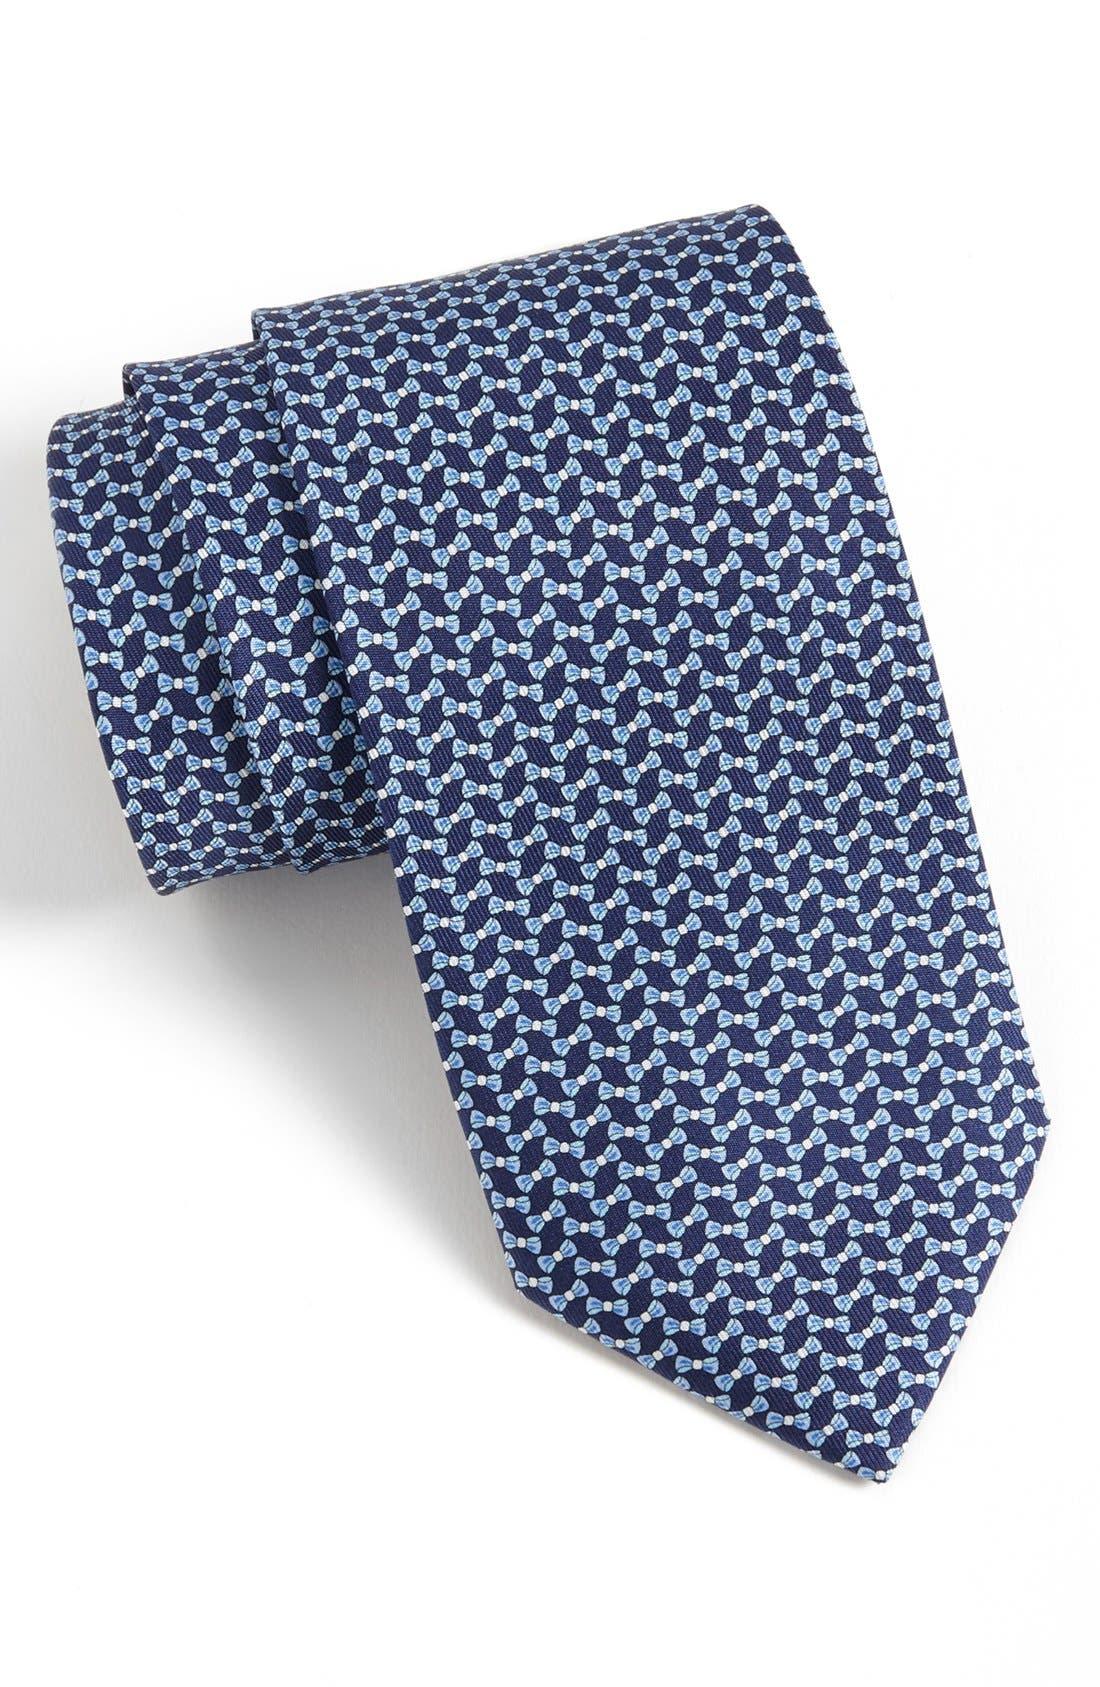 Alternate Image 1 Selected - Salvatore Ferragamo Bow Print Silk Tie